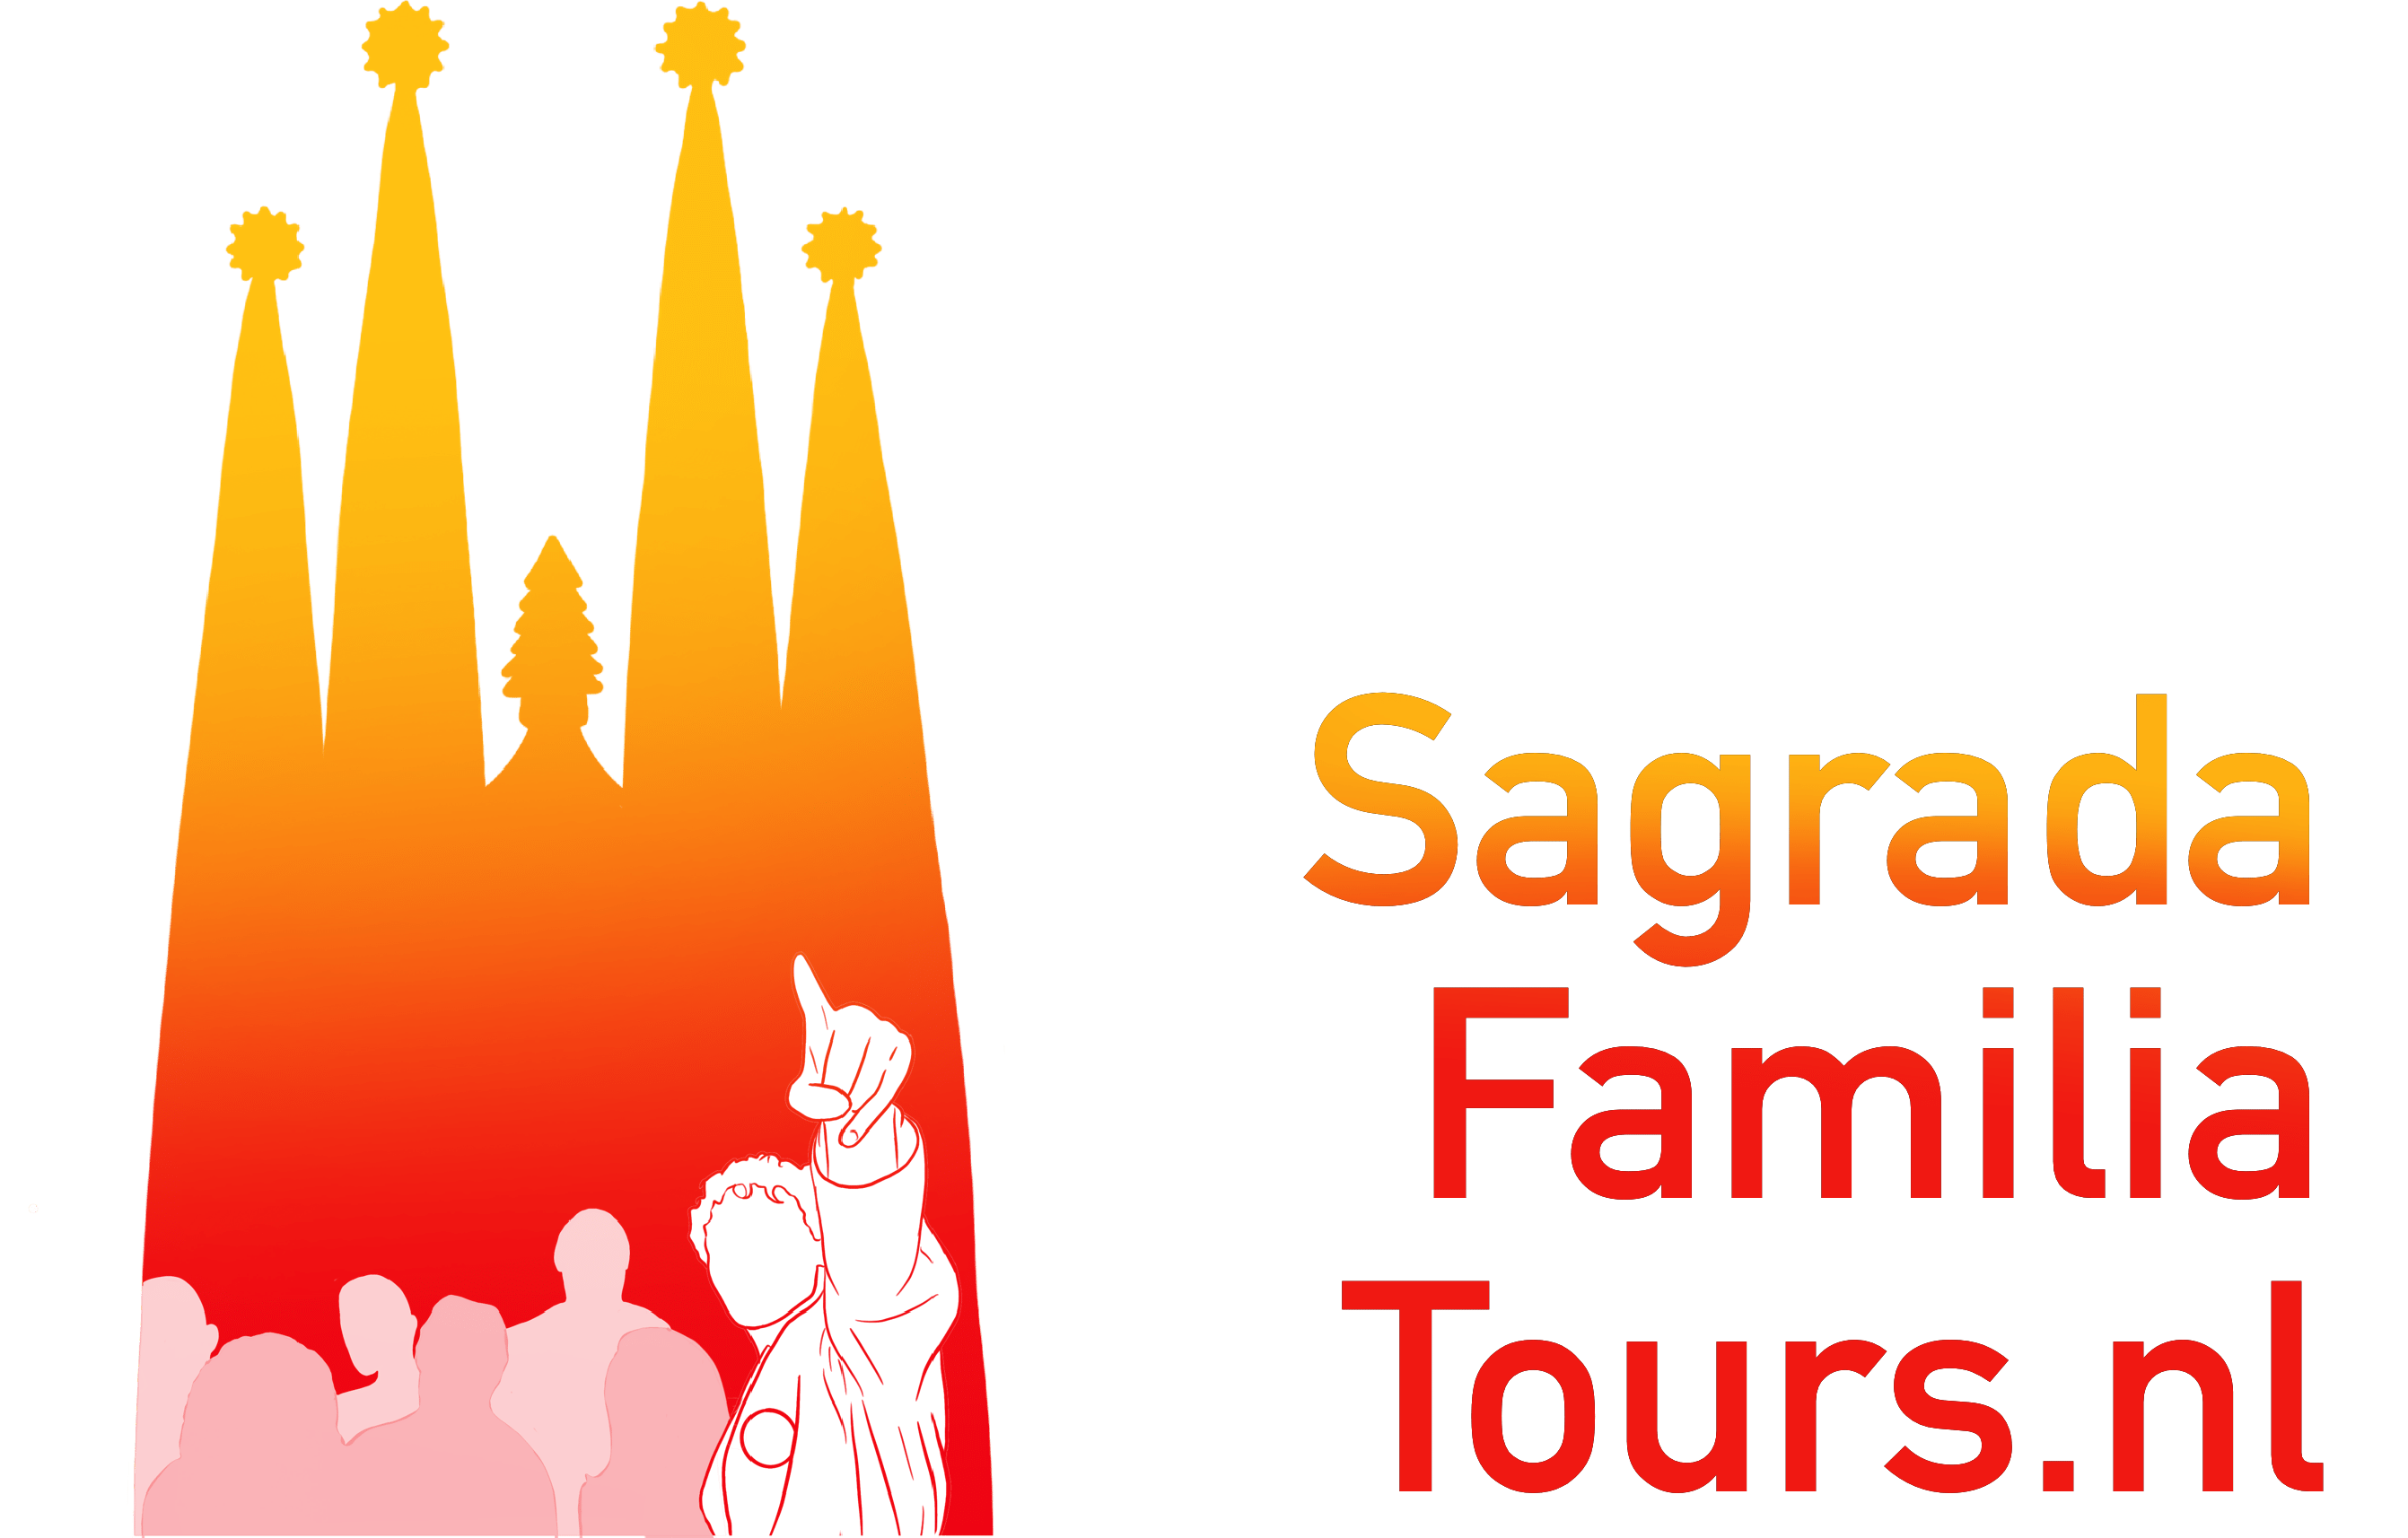 Sagrada Familia Tours - Best tour experience in Barcelona